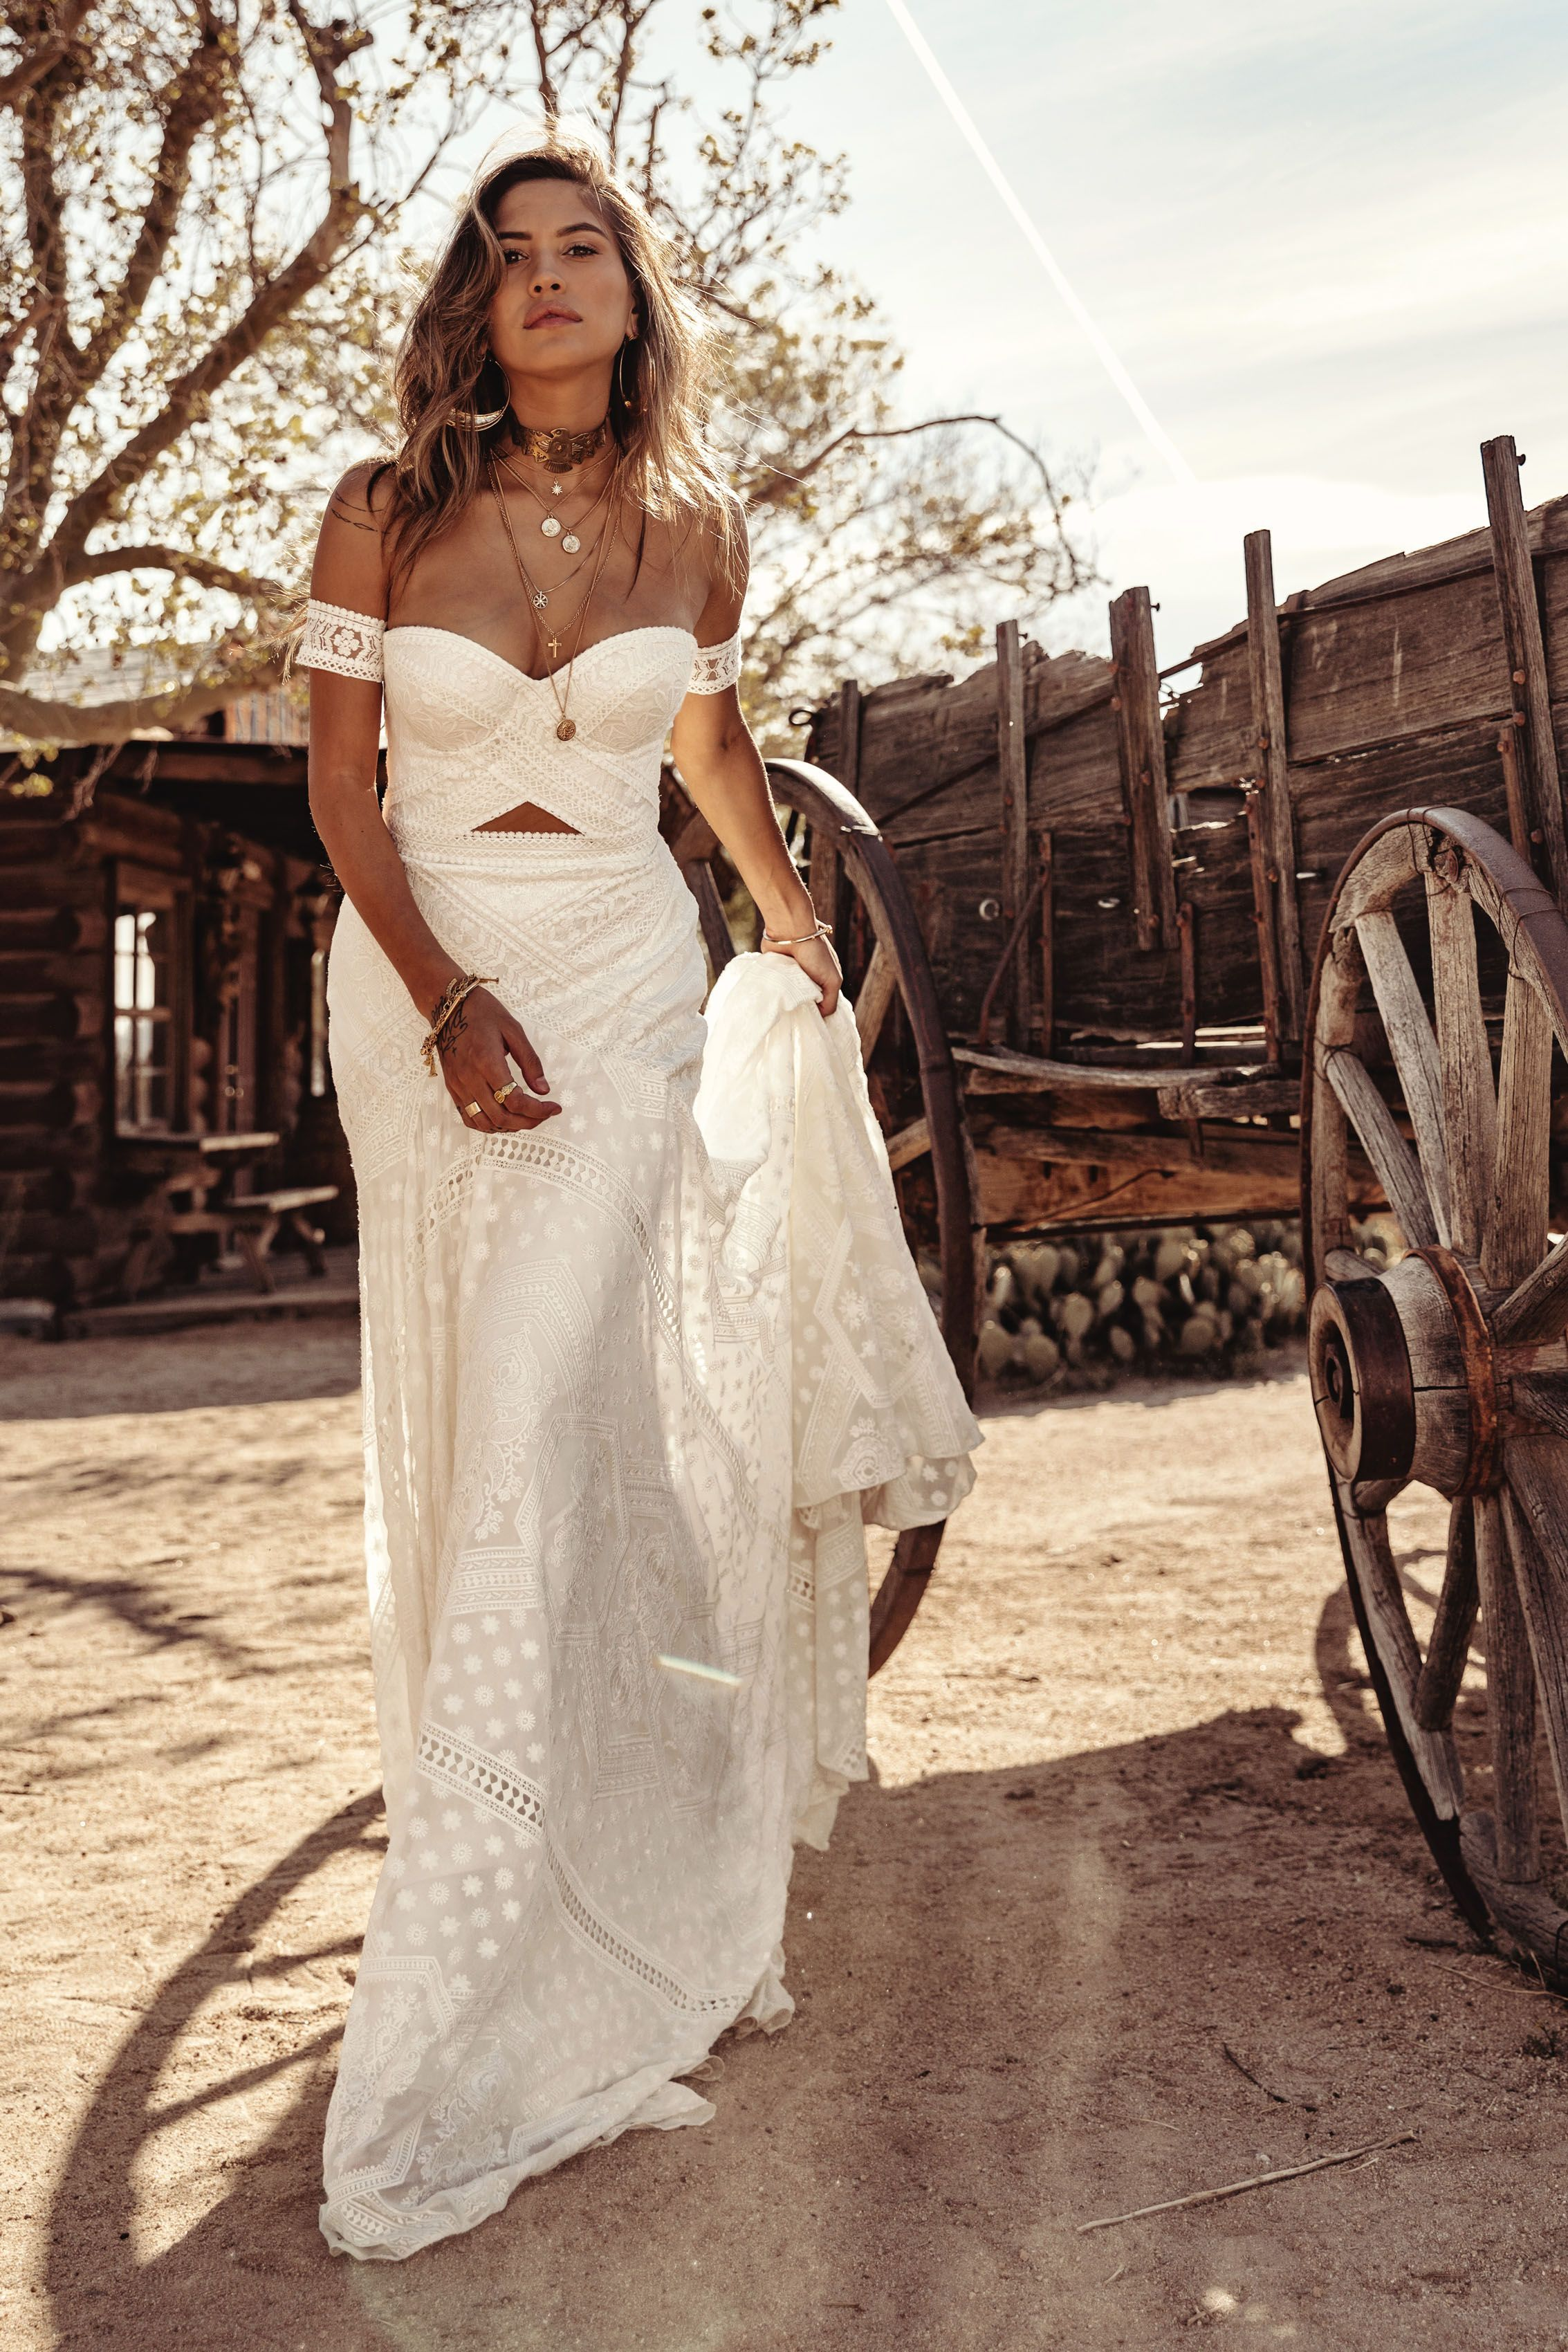 Knoxville-jurk van Rue De Seine  Moonrise Canyon Collectie 20